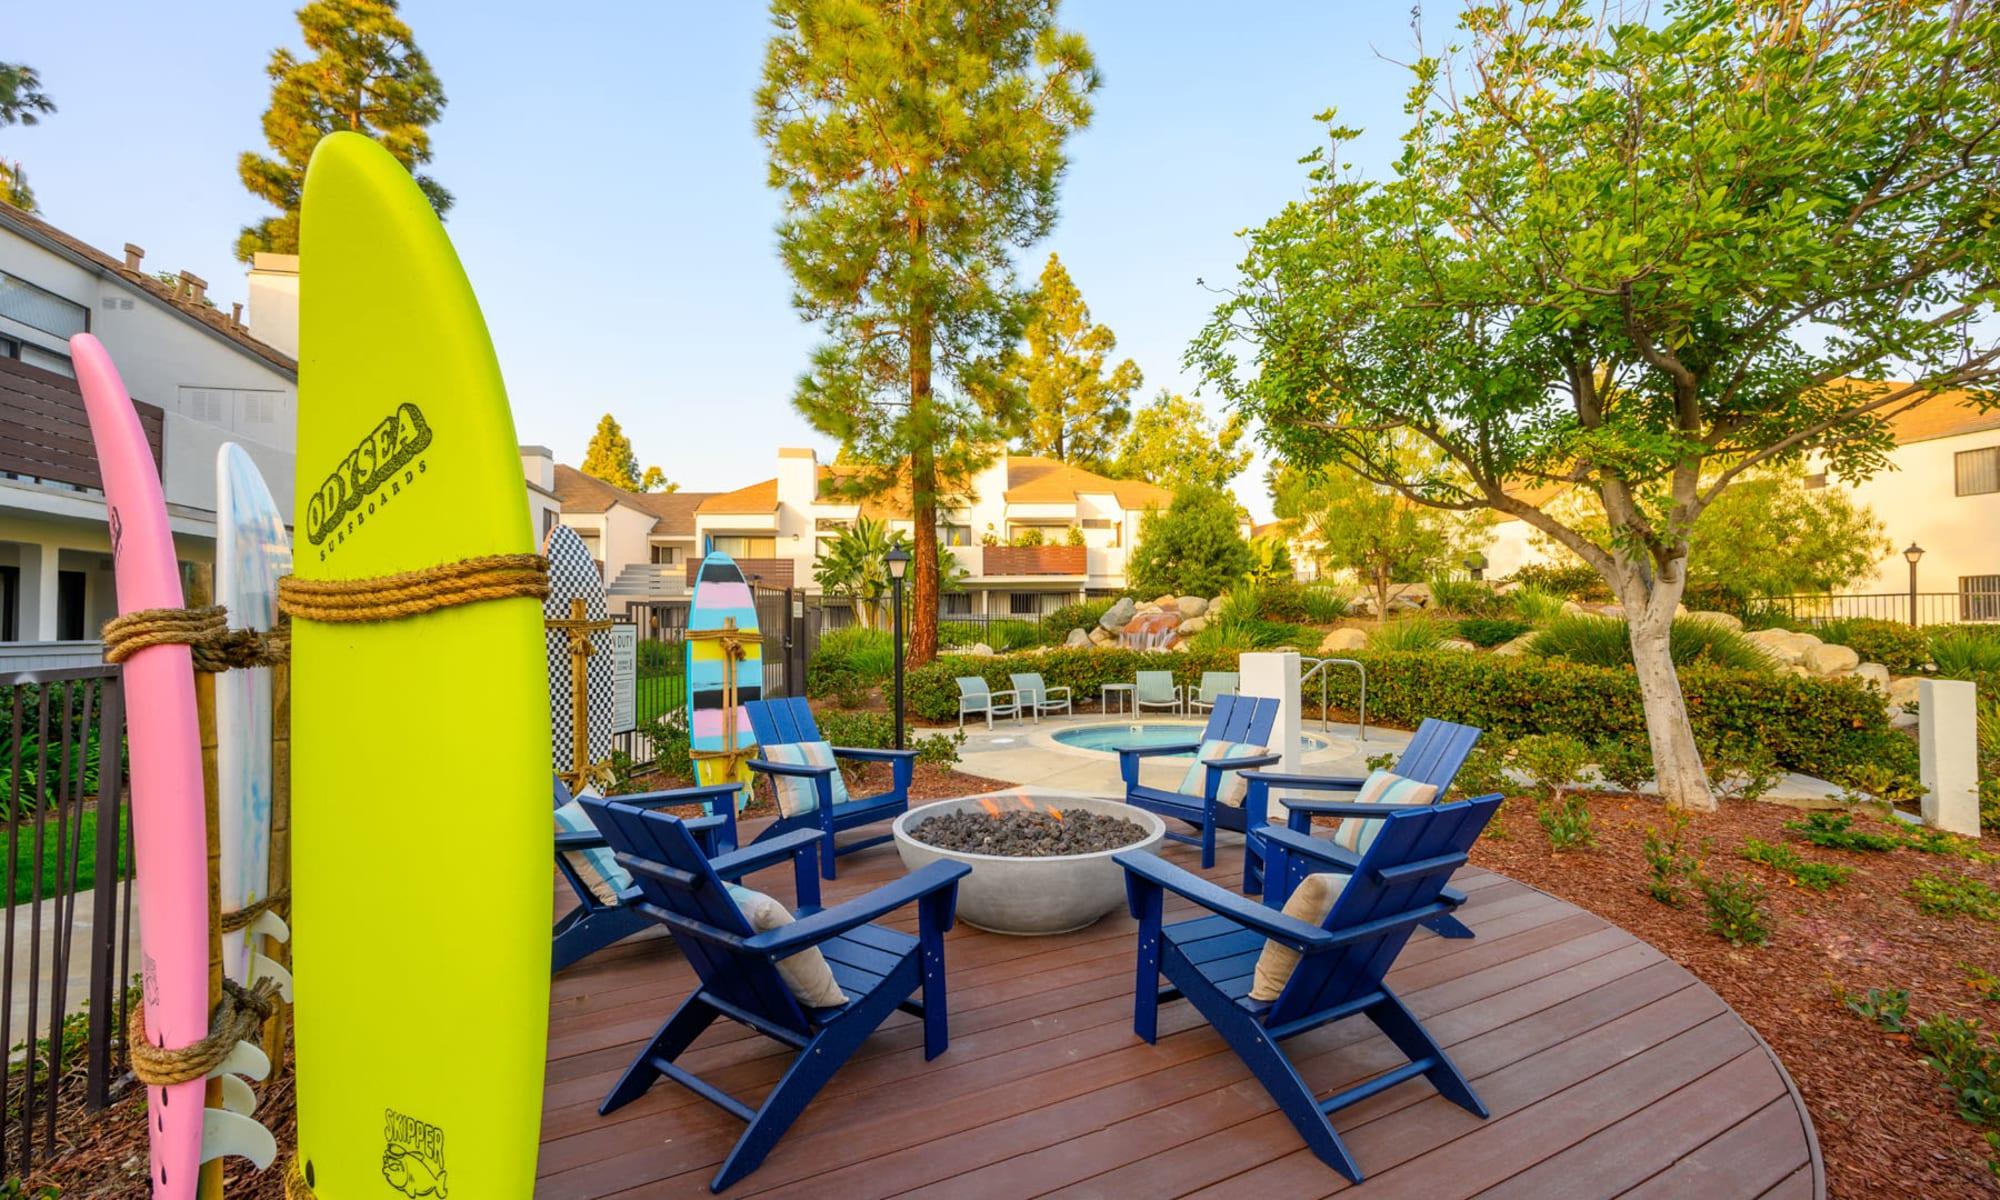 Surfboards and Adirondack chairs around the fire pit at Sendero Huntington Beach in Huntington Beach, California